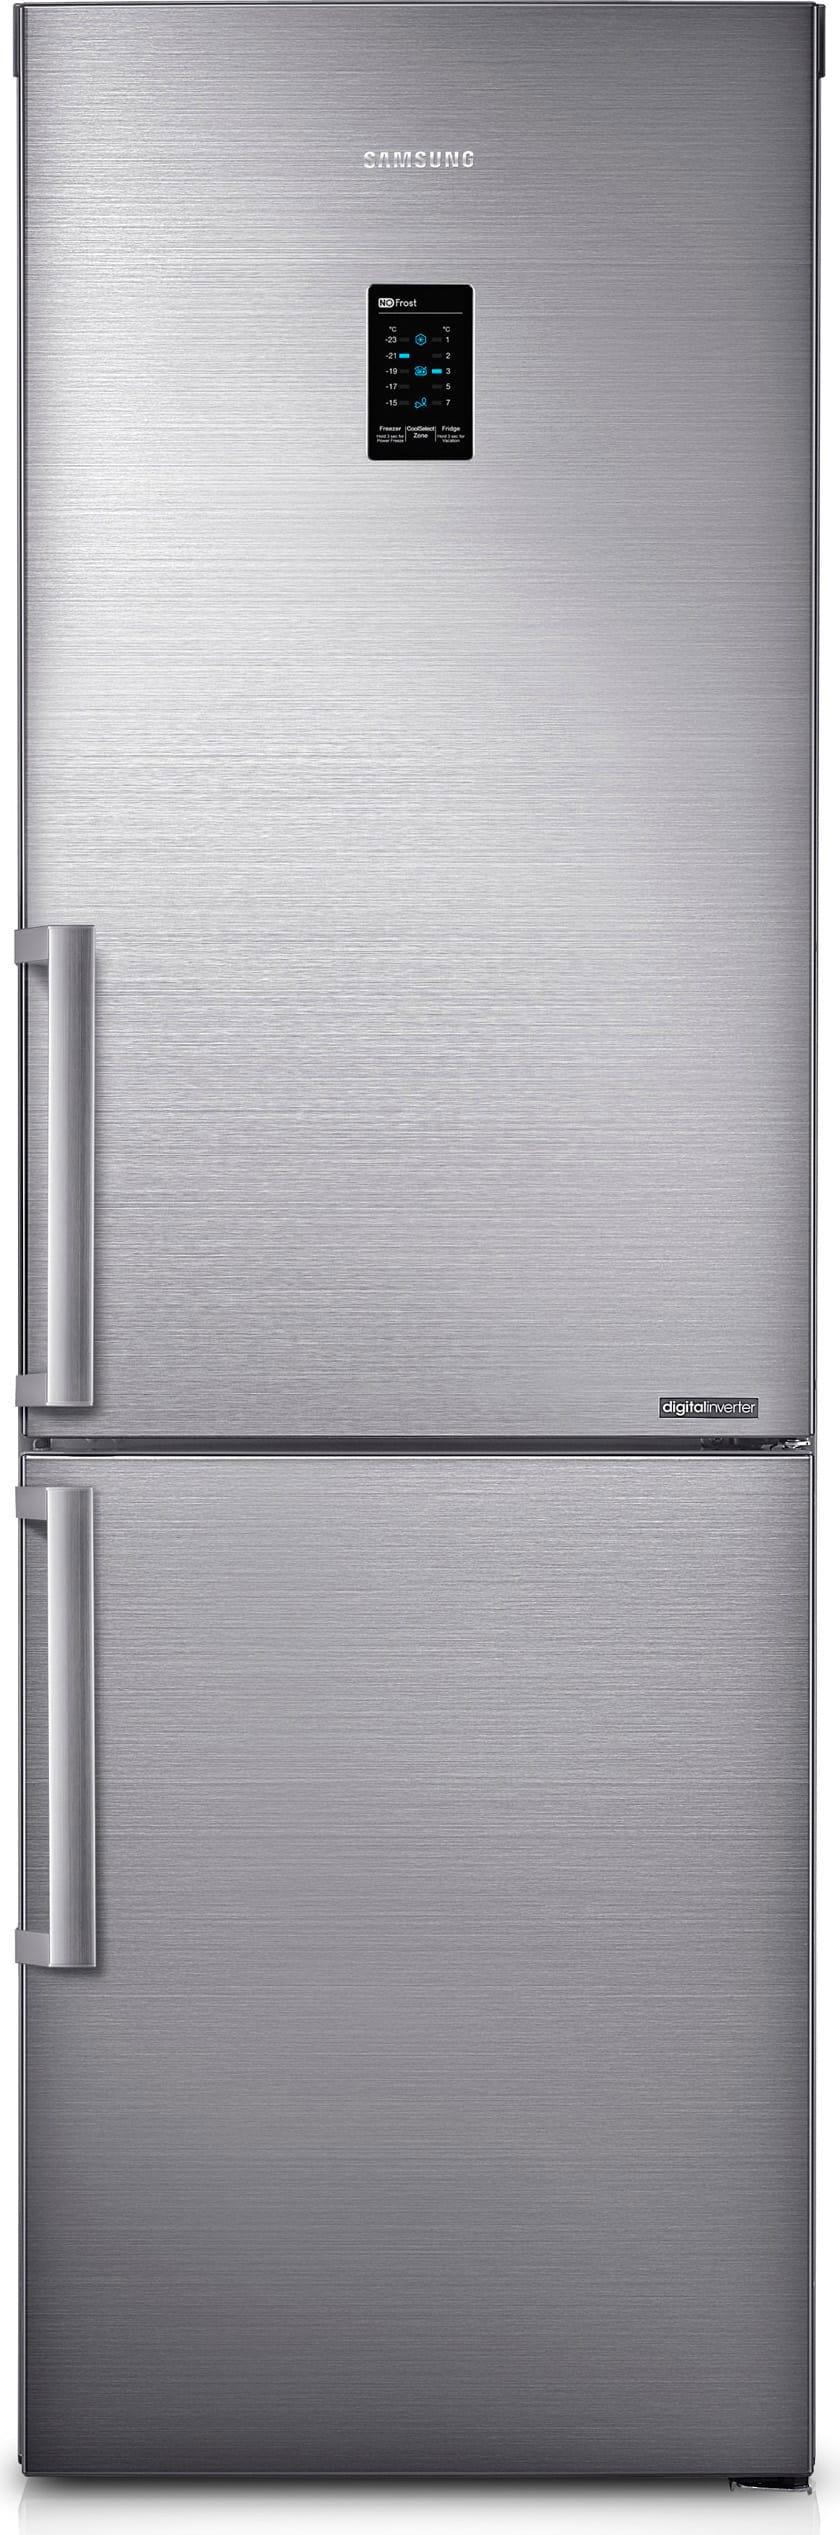 Samsung Frigorifero Combinato 325 Lt Classe A+++ No Frost Inox RB31FEJNBSS